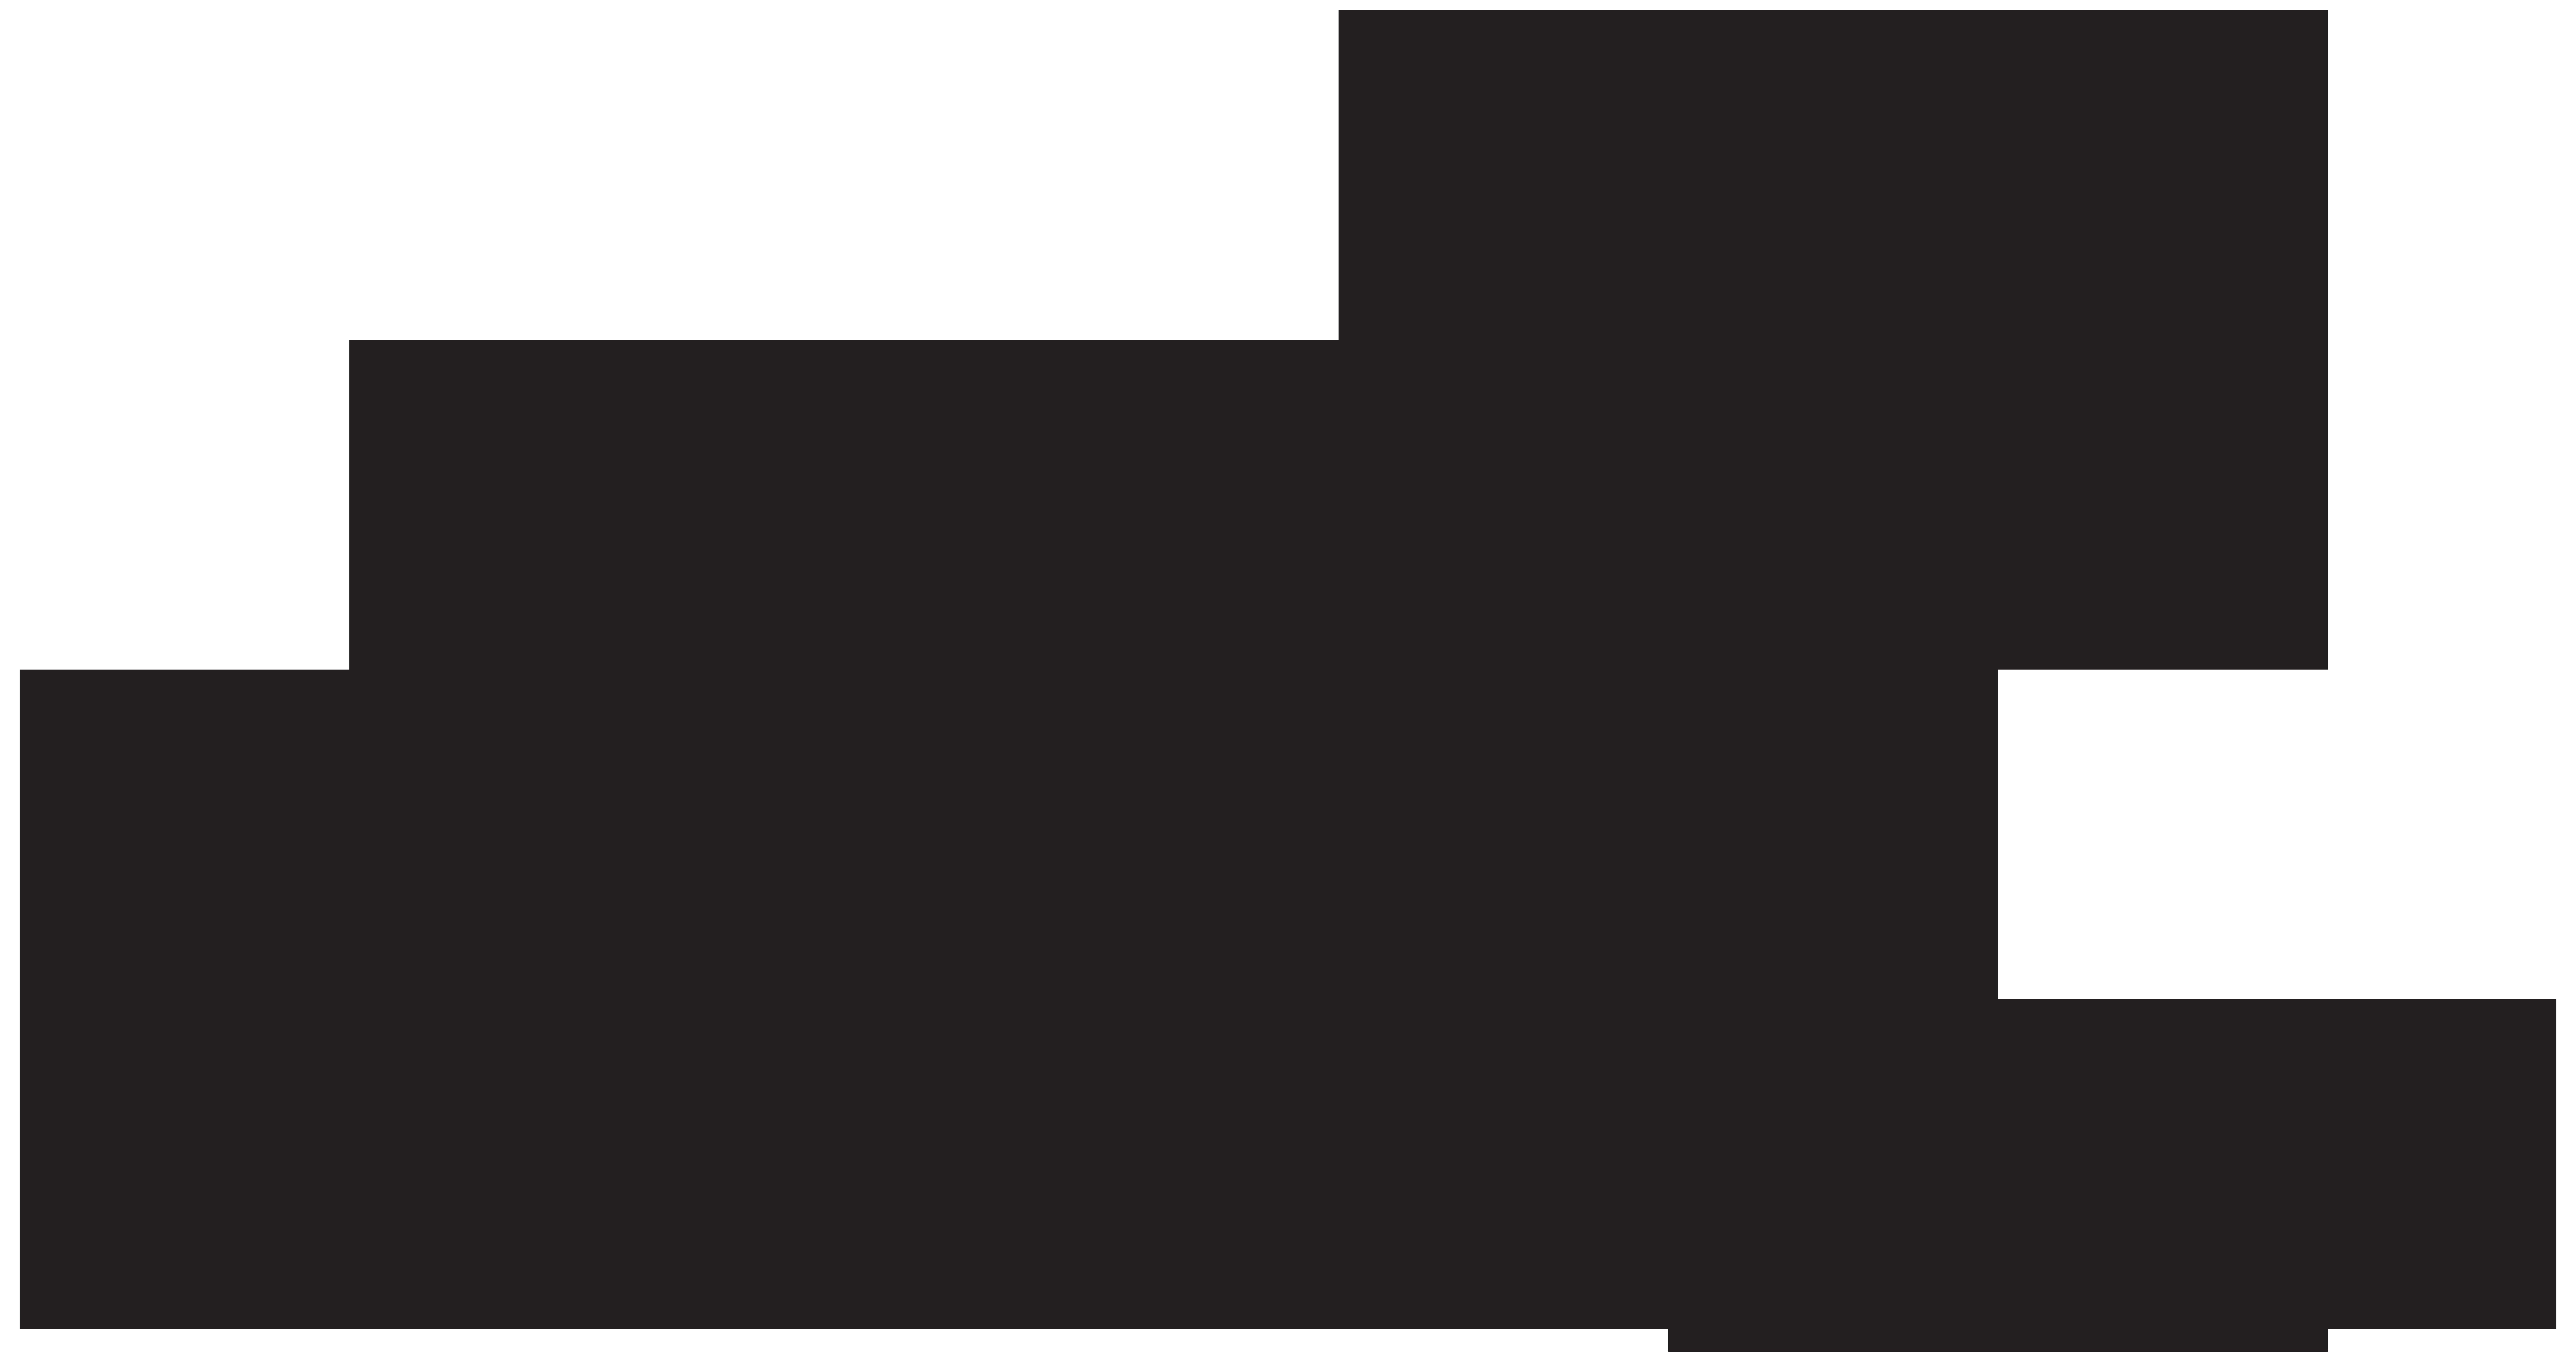 Nativity Scene Silhouette PNG Clip Art Image.